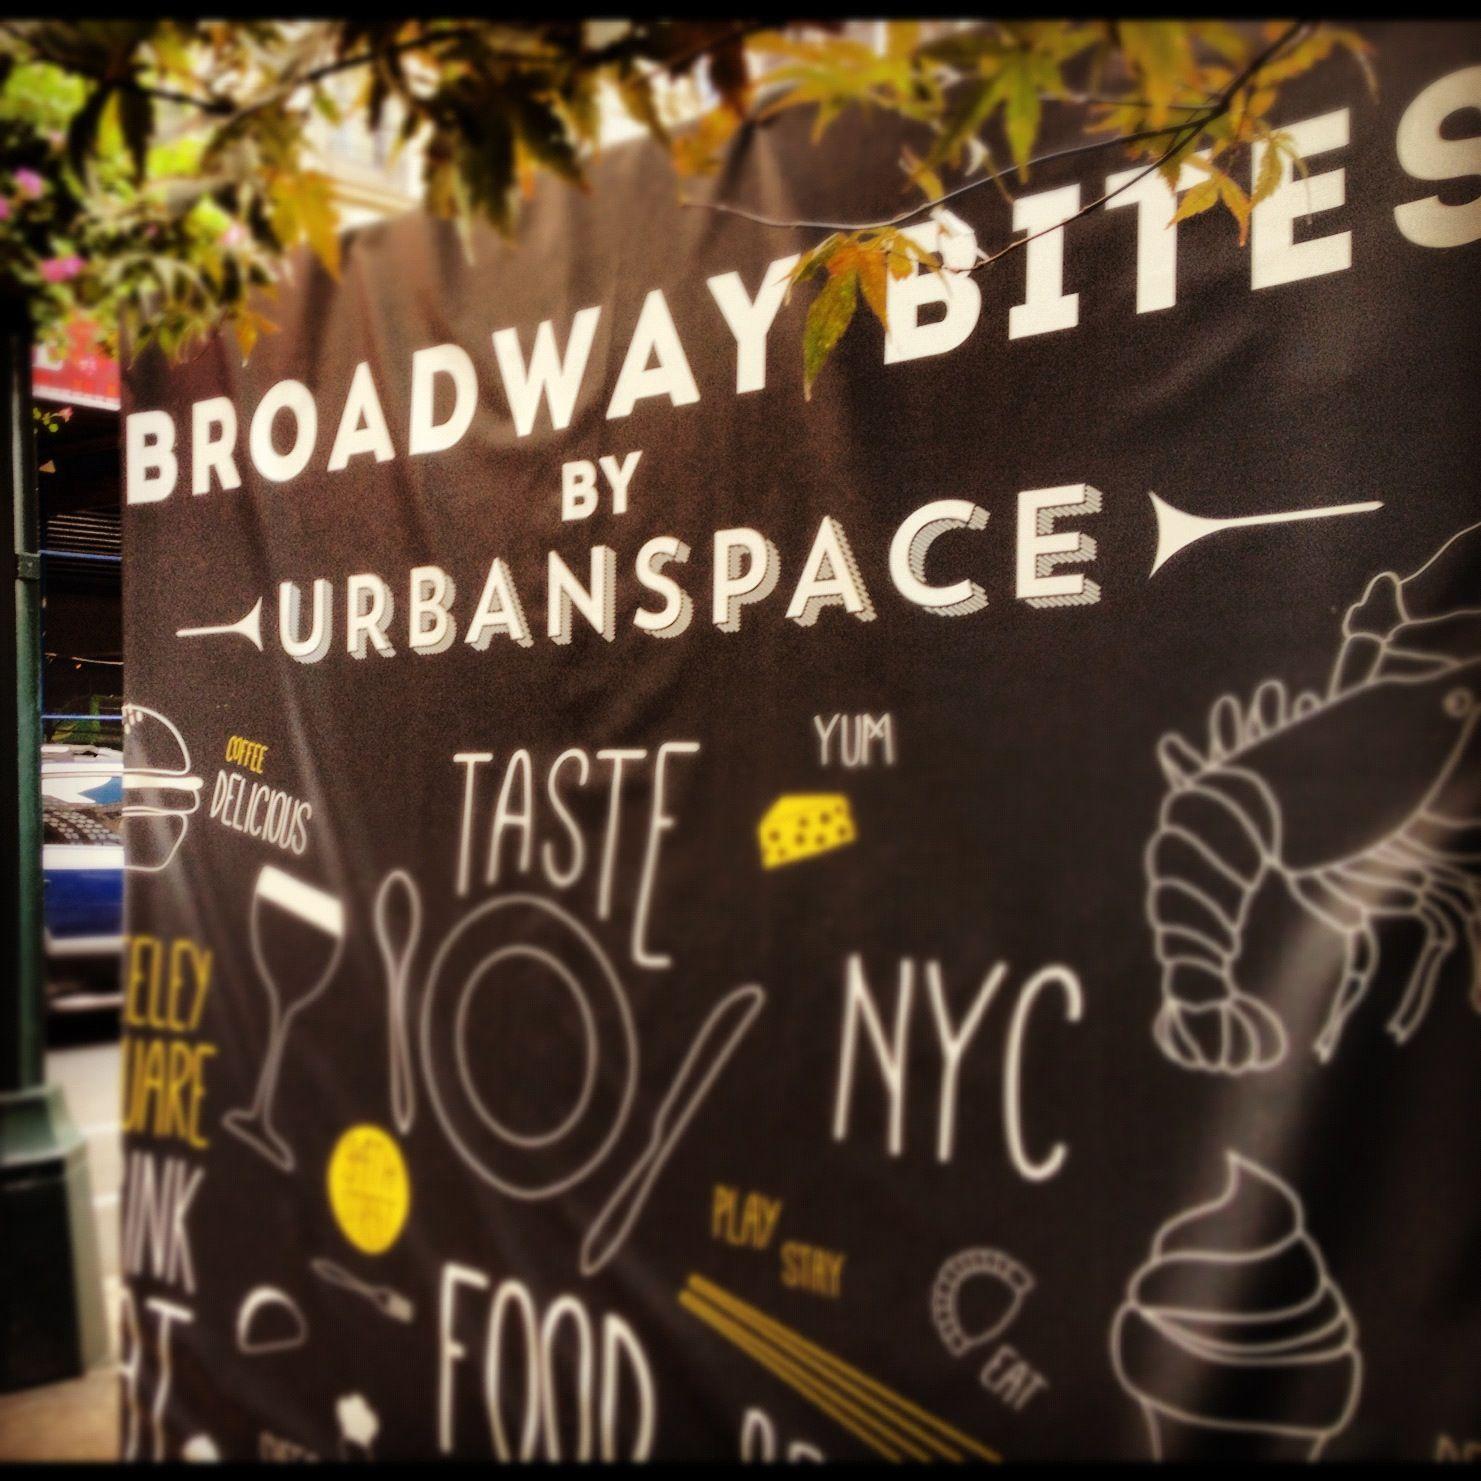 Broadway bites food festival greeley square new york